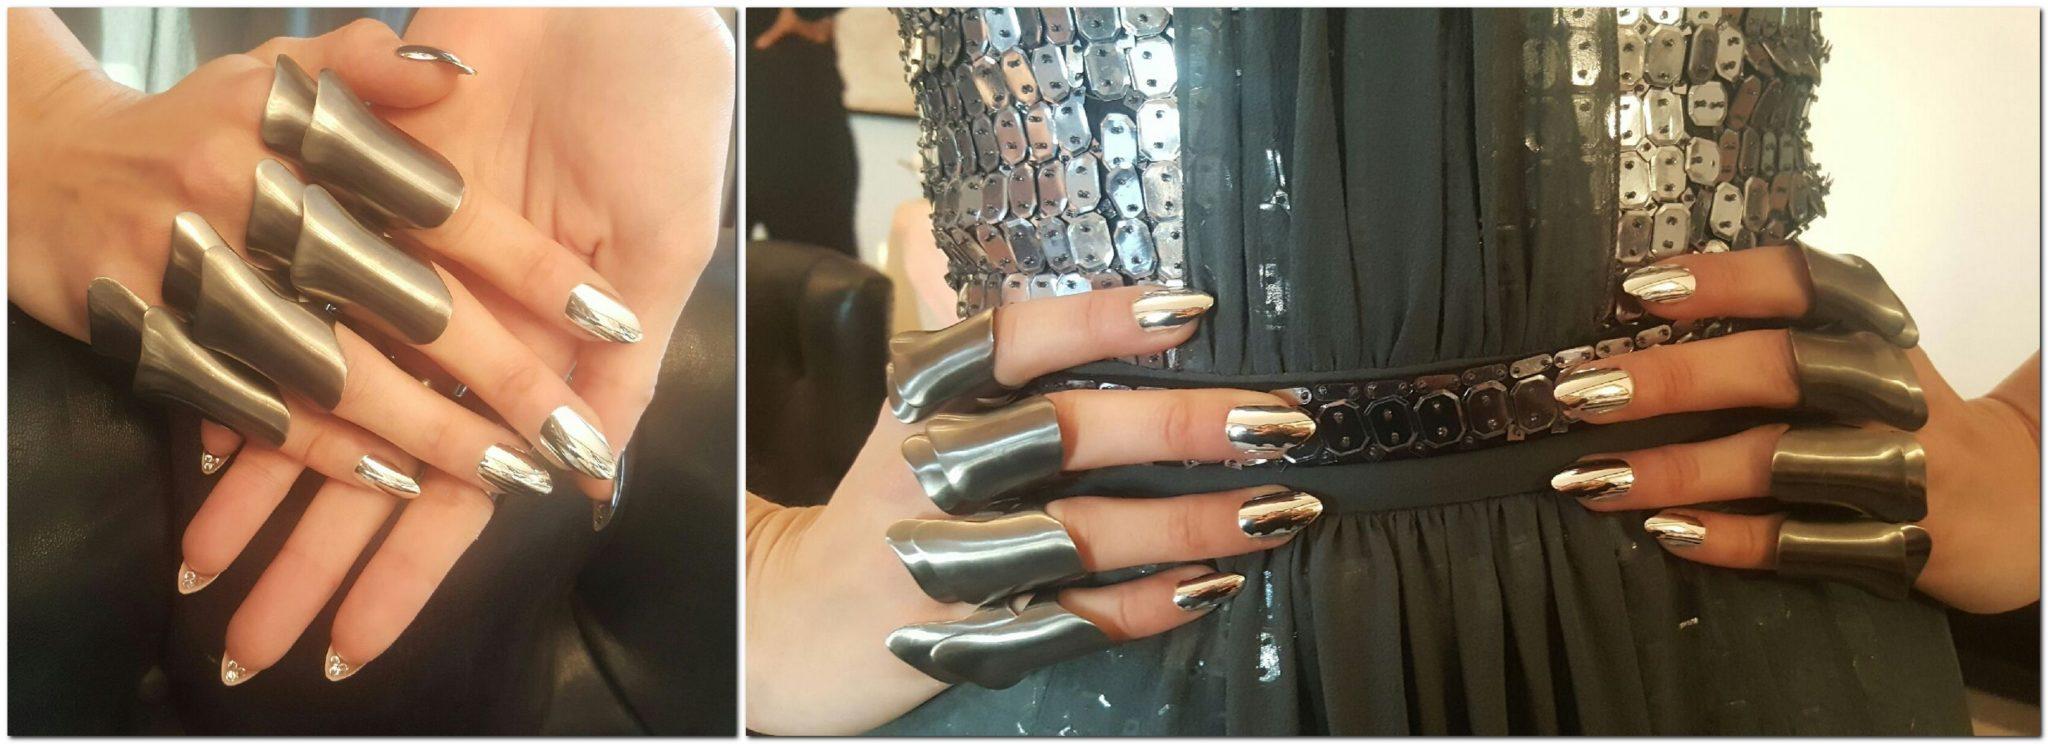 celebs-expensive-manicure-1-4